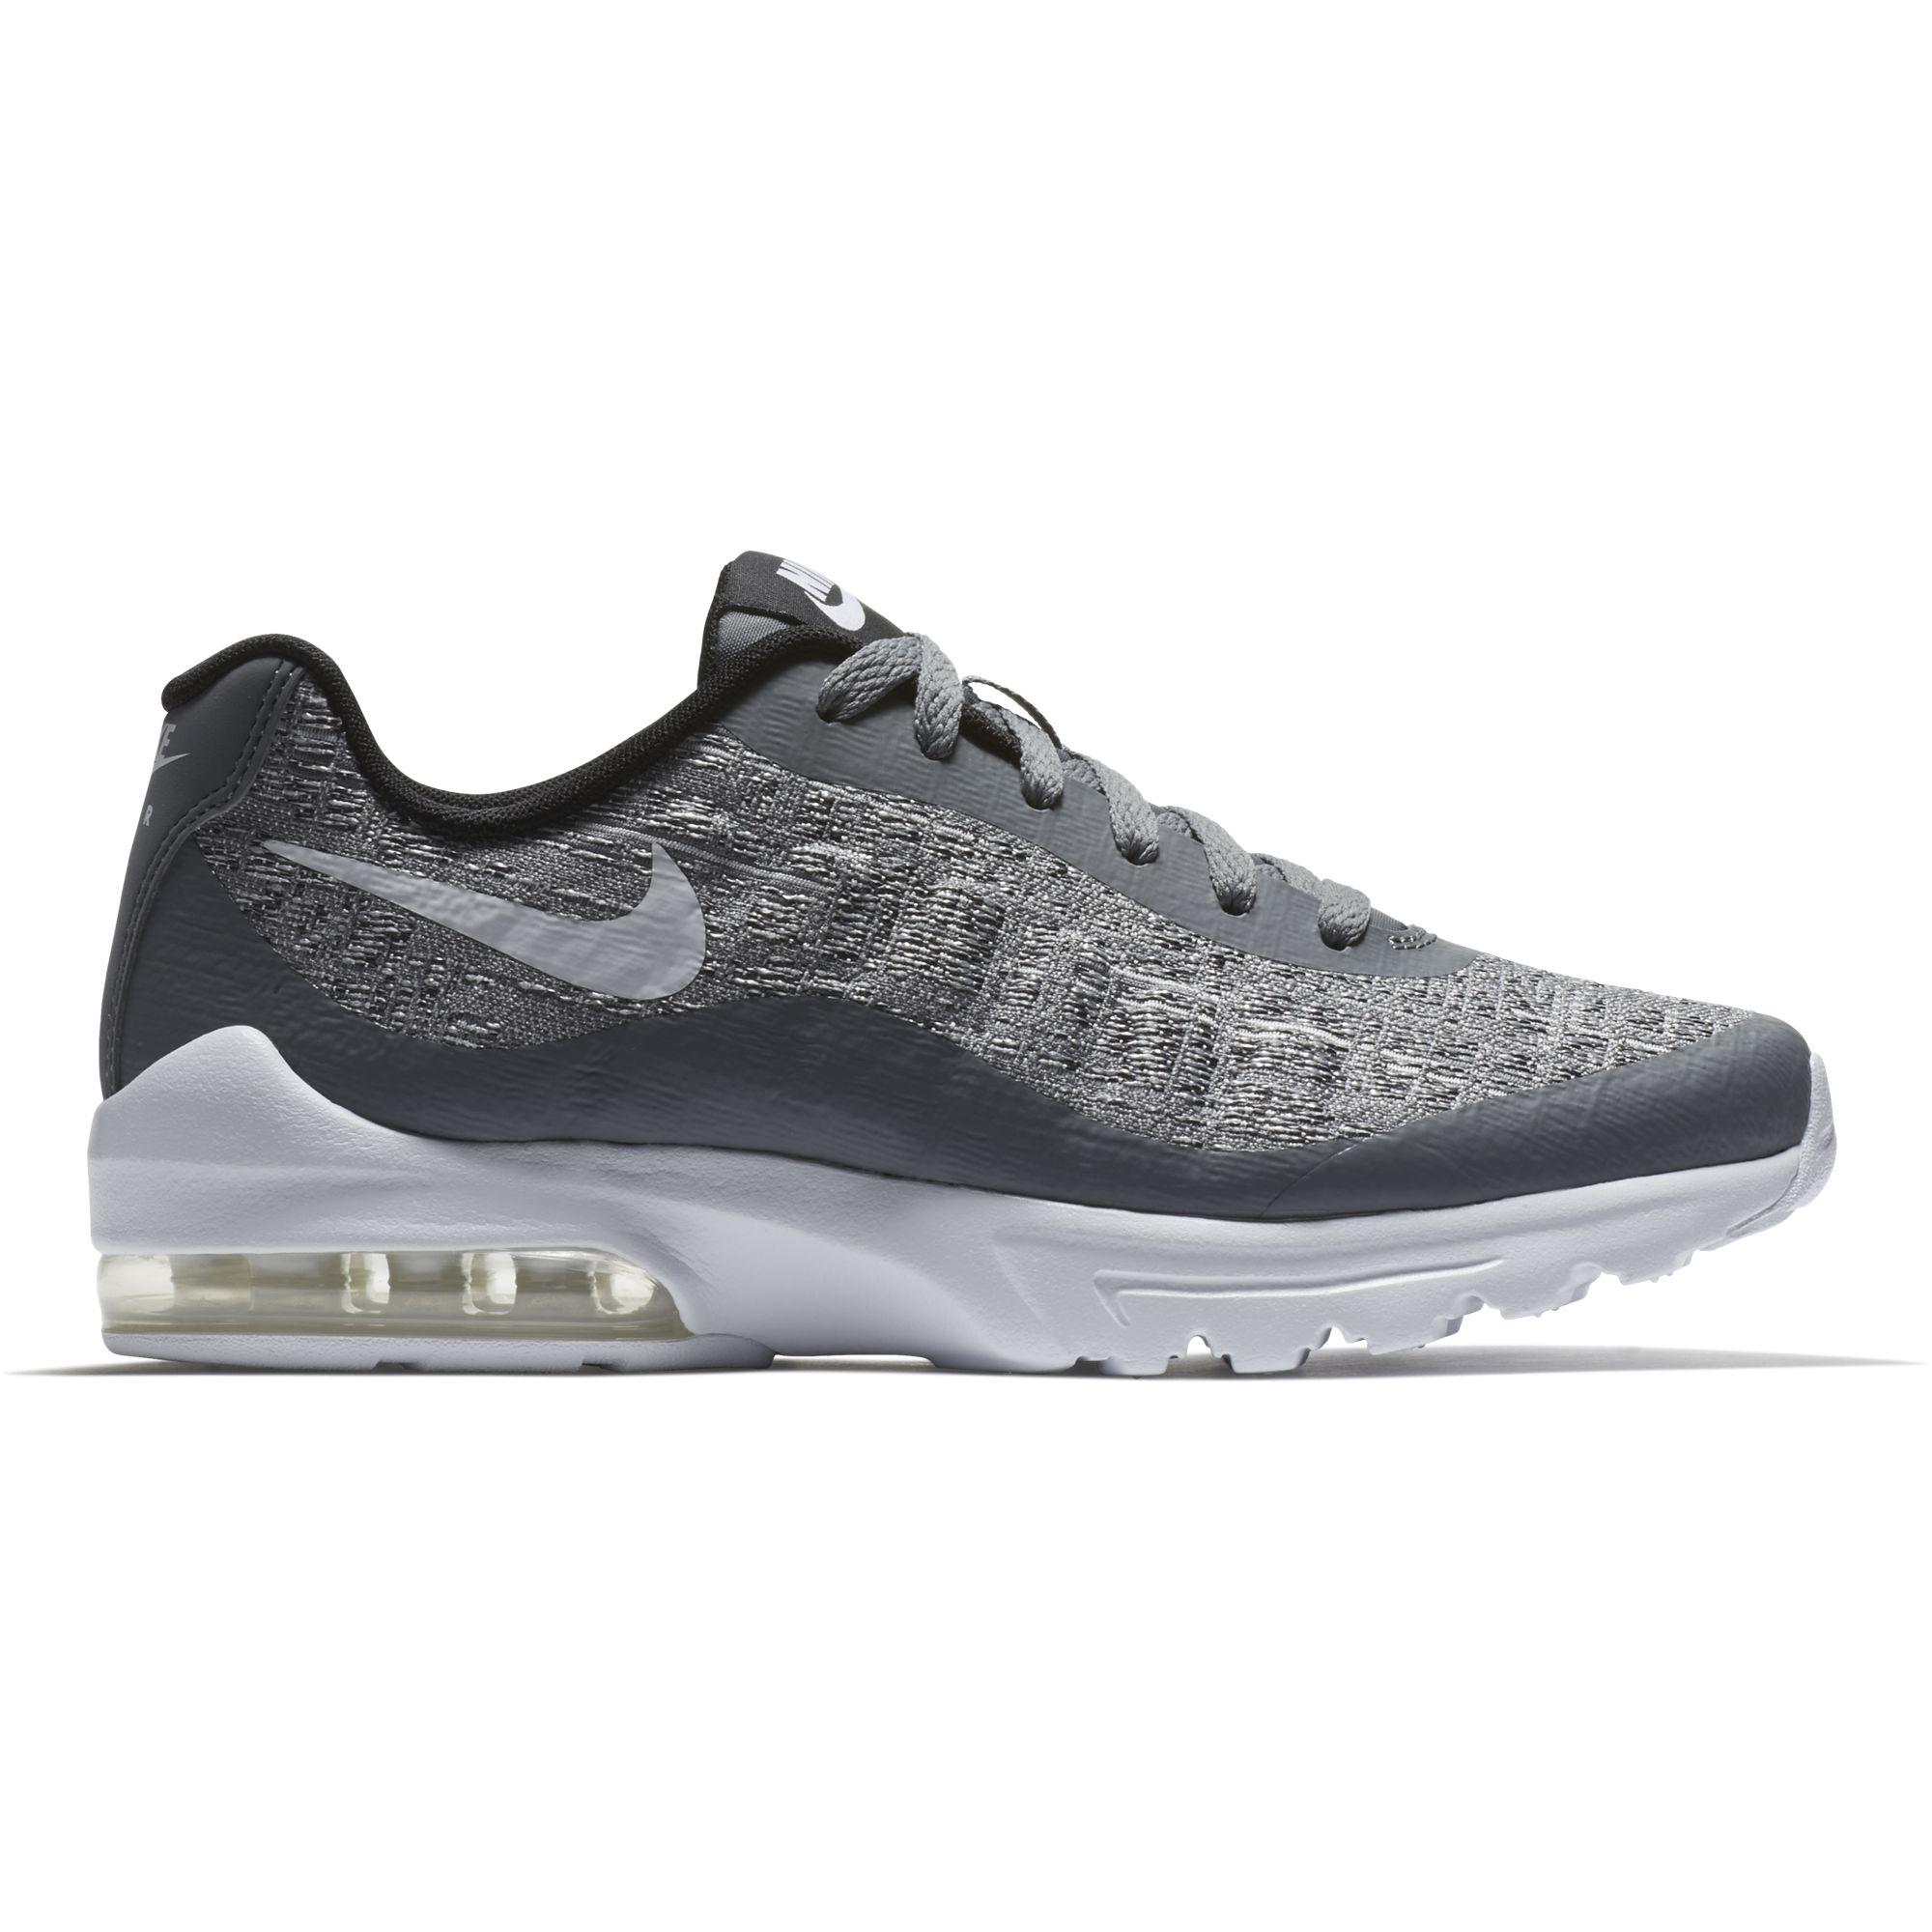 the best attitude 0eead cf0b5 Nike Womens Air Max Invigor WVN Running Shoes - Cool Grey White -  Tennisnuts.com